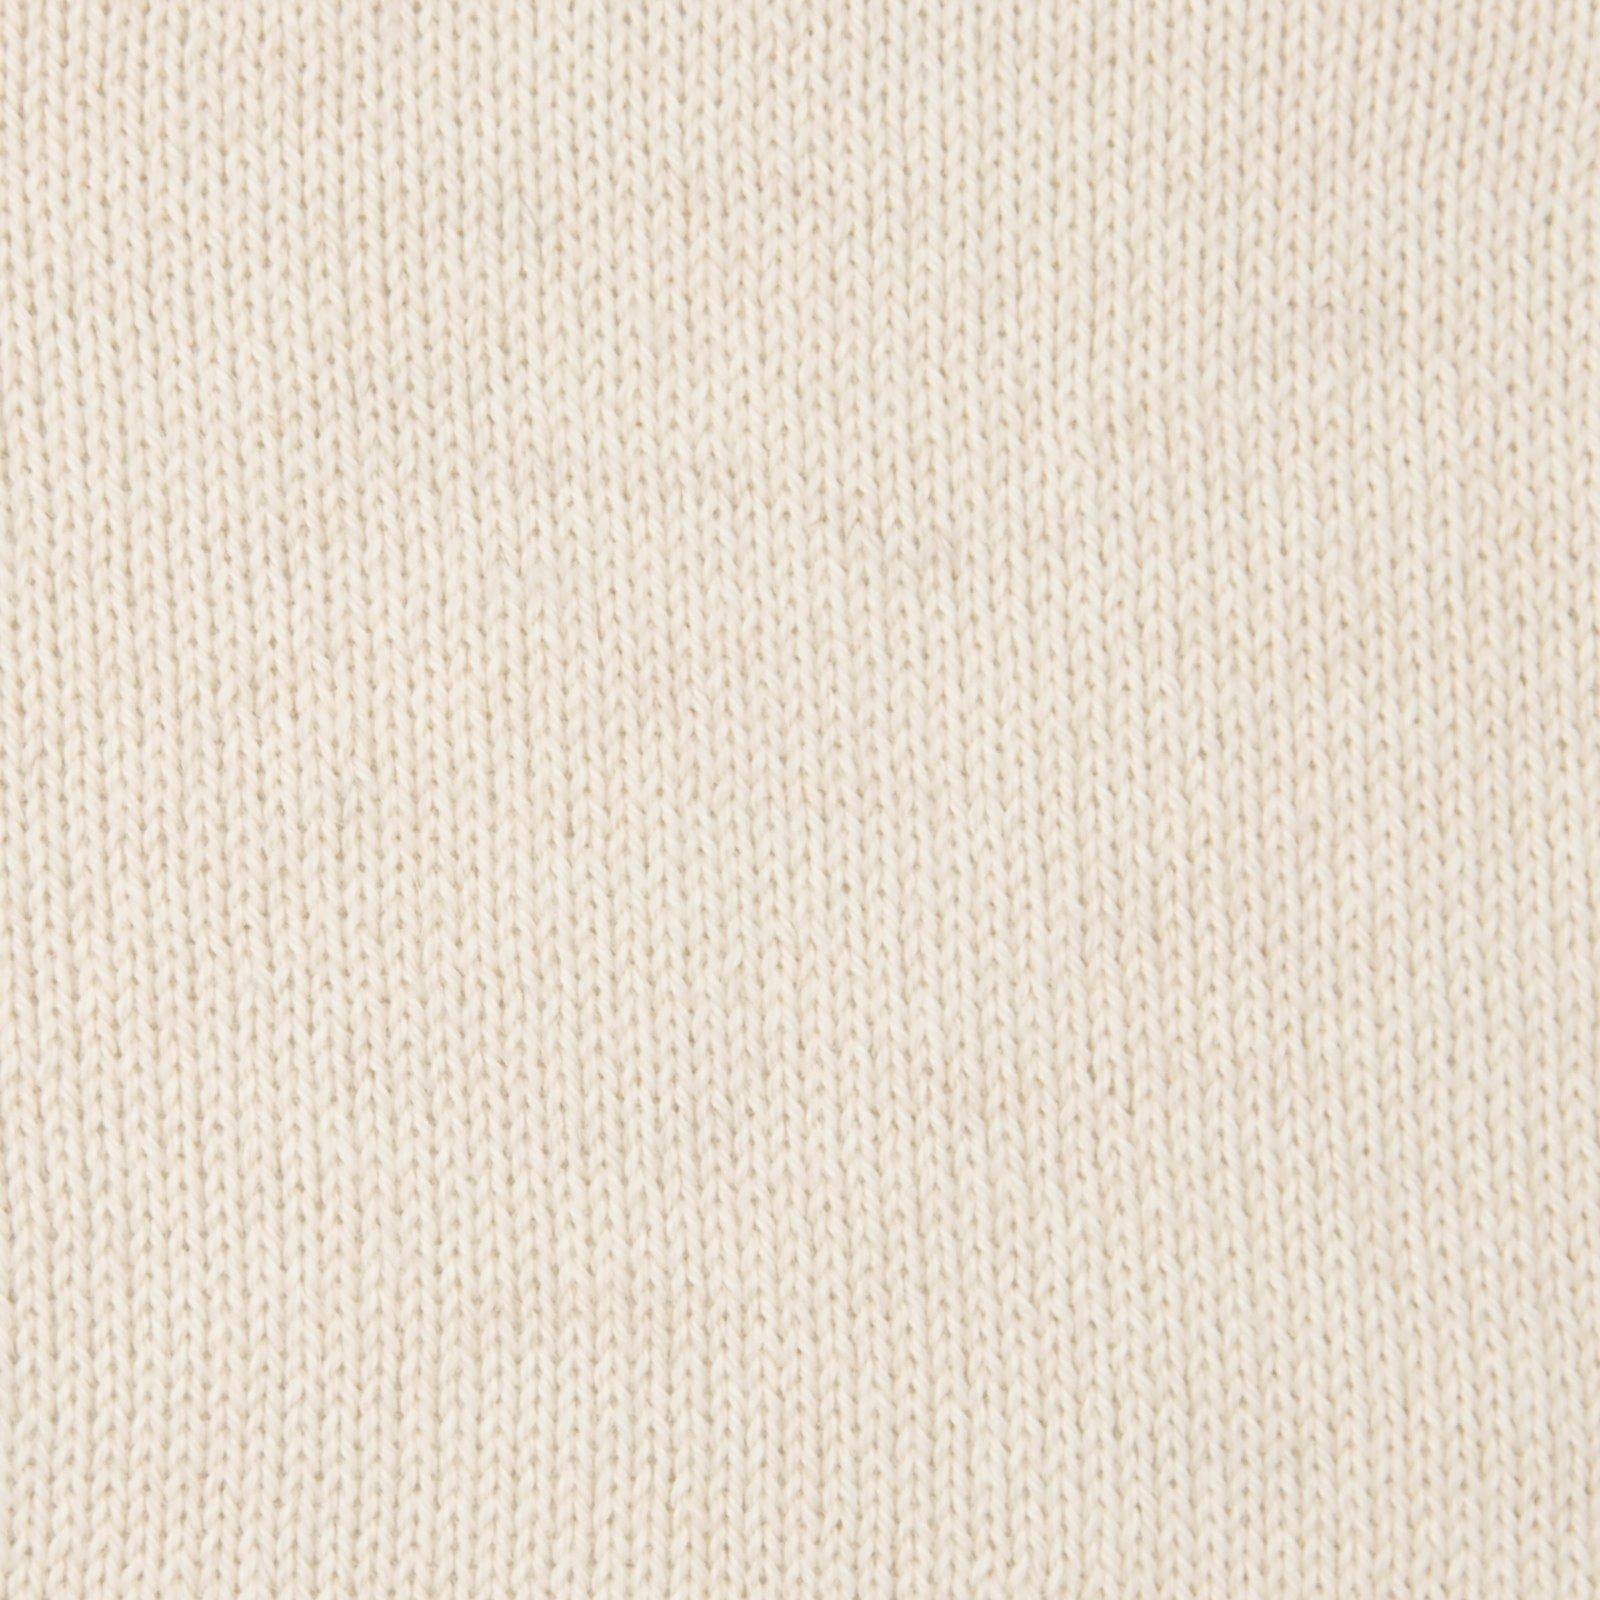 Woolly 50g grey melange 90000069_90000070_90000071_90000073_90000079_90000080_sskit